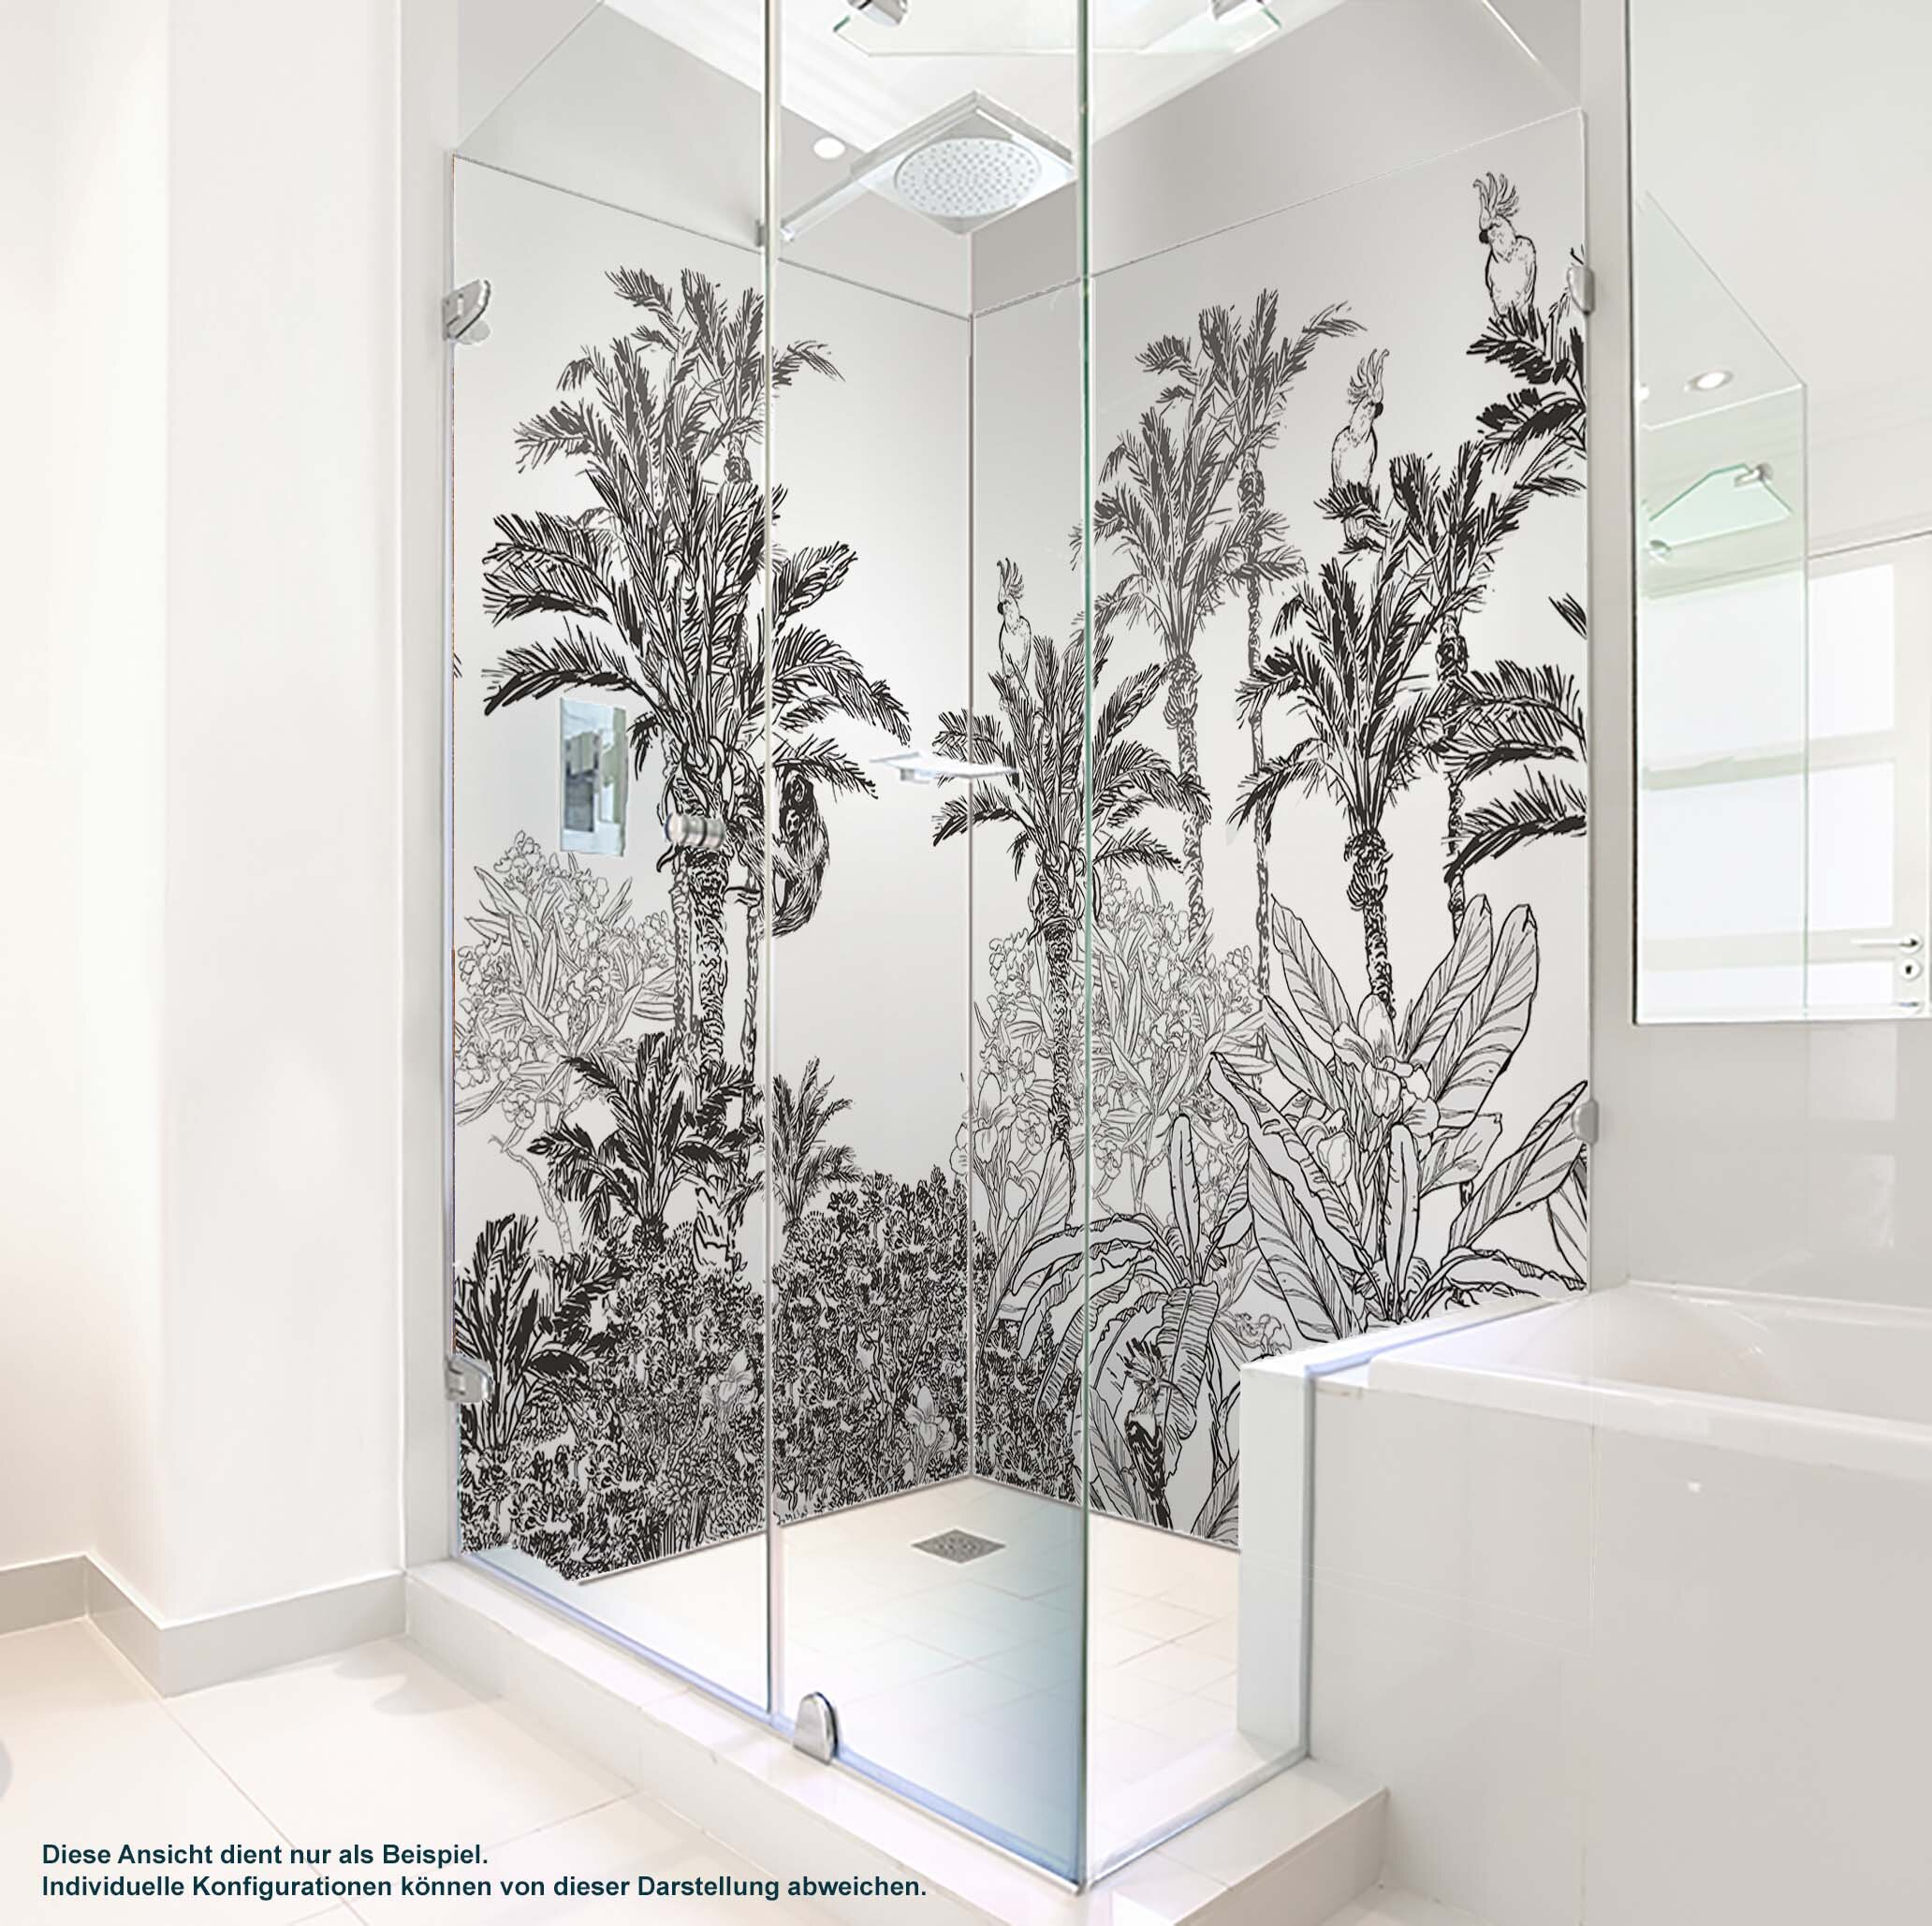 Dusche PlateART Duschrückwand mit Motiv Schwarz Weiß Dschungel